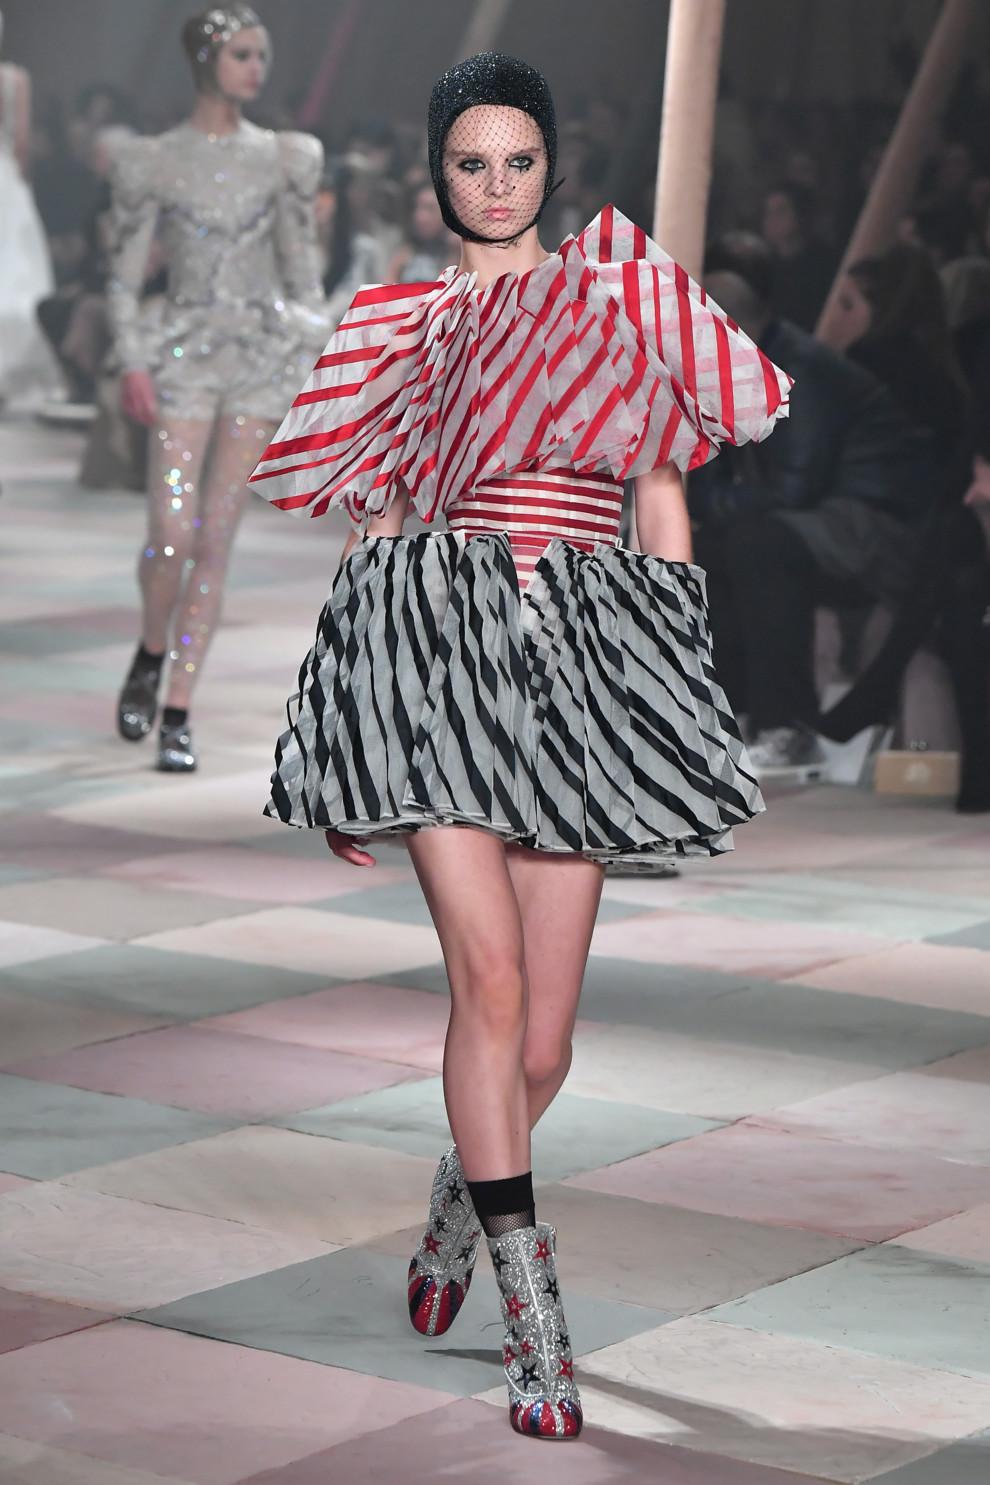 5c46dc891405b - Плечом к плечу: Dior Couture весна-лето 2019